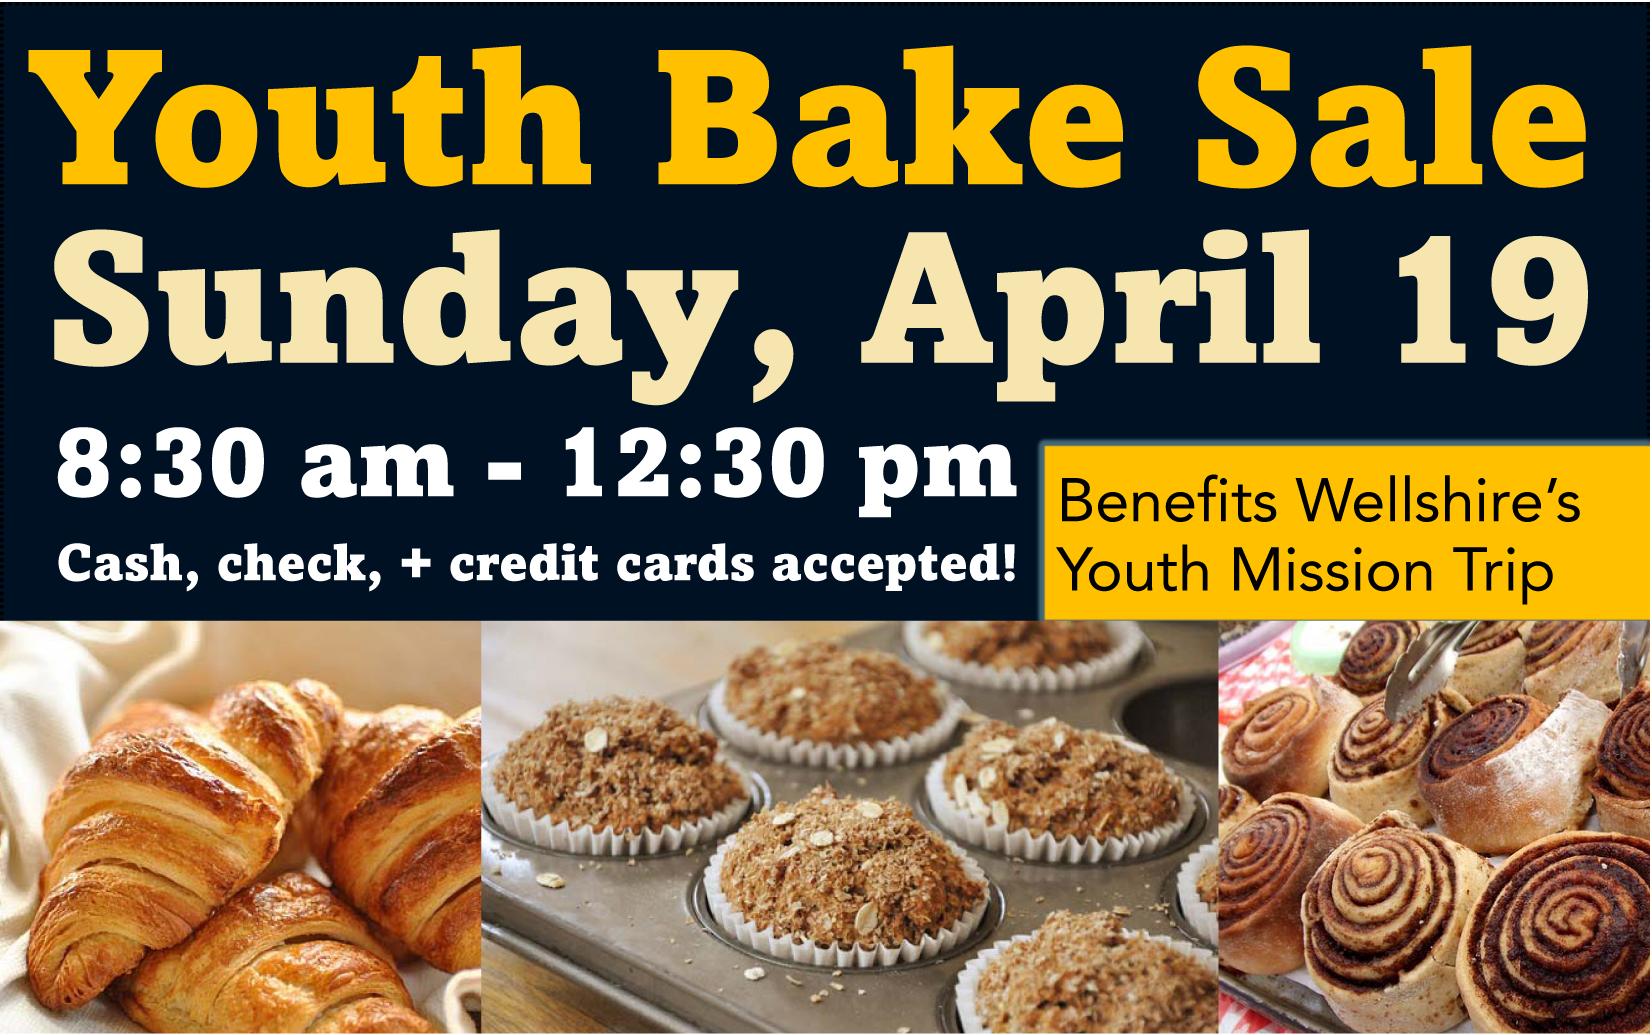 Youth Bake Sale April 19